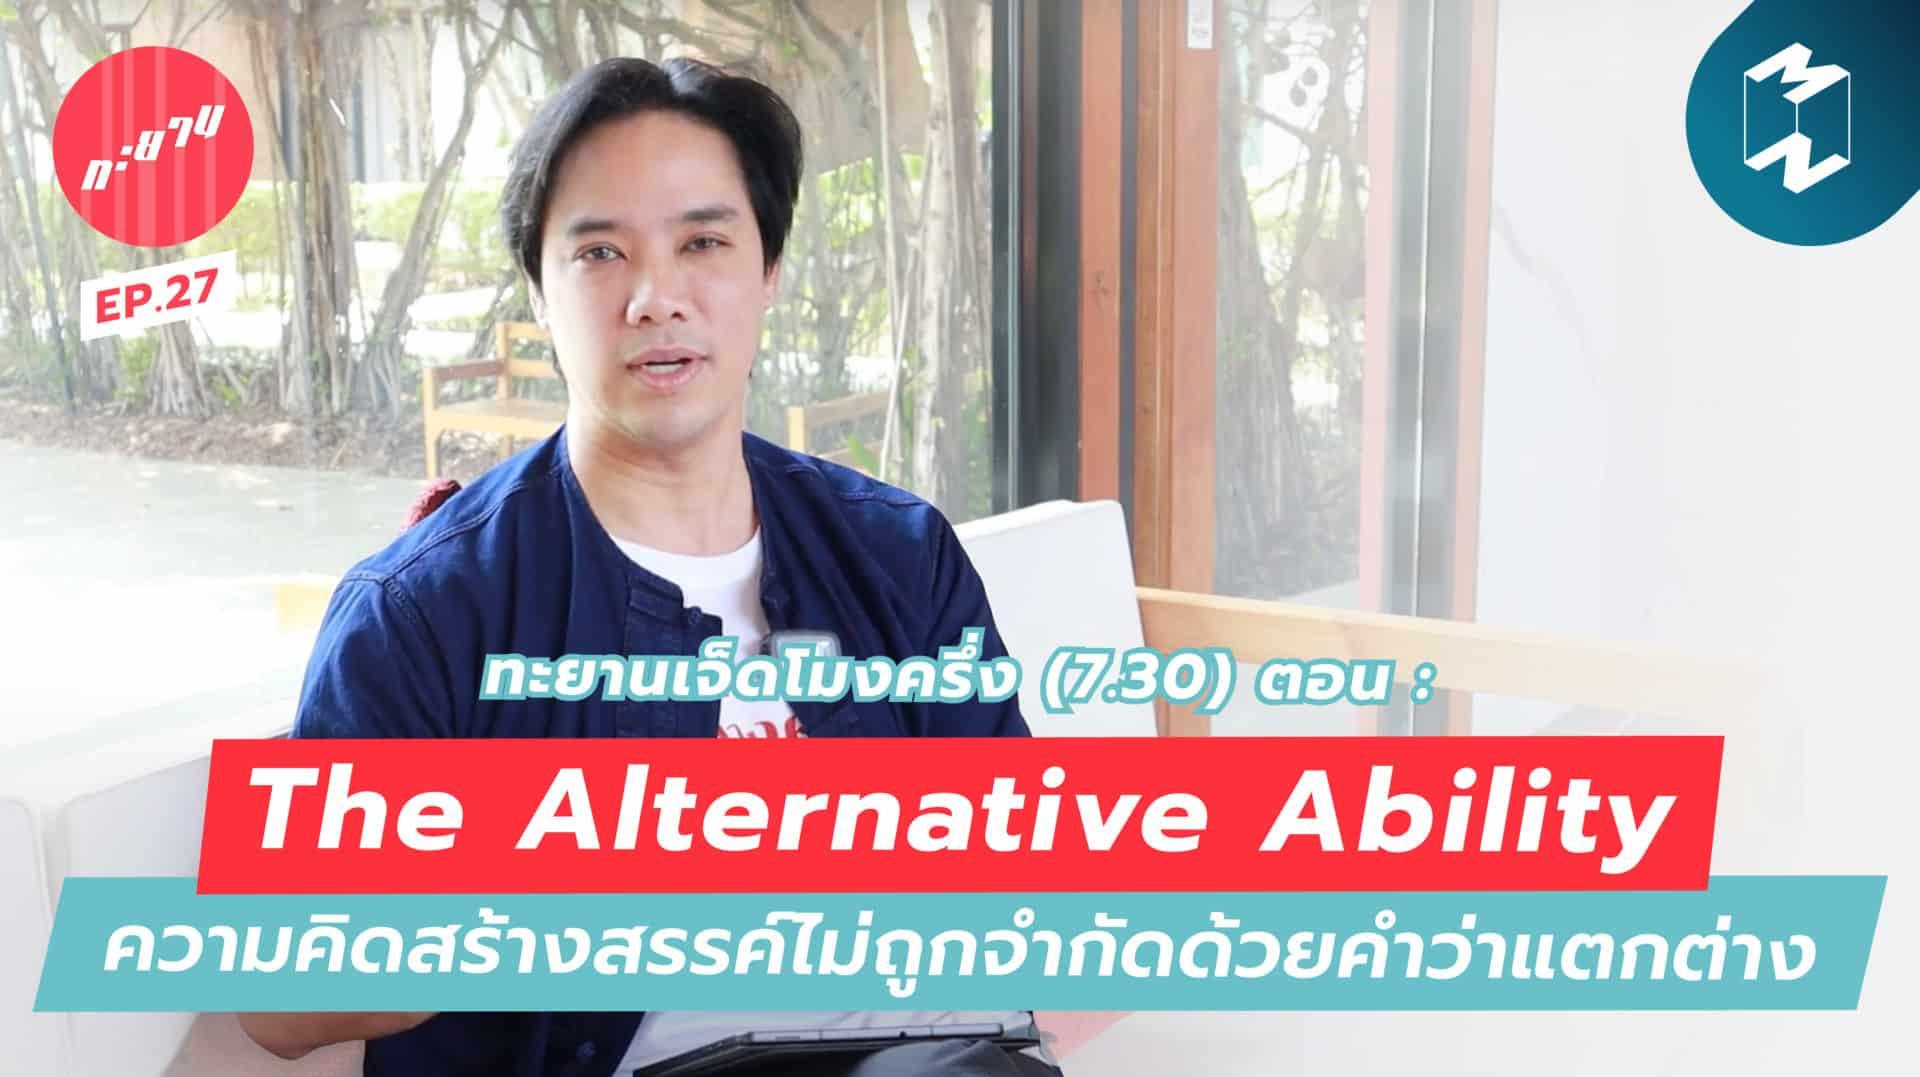 The Alternative Ability